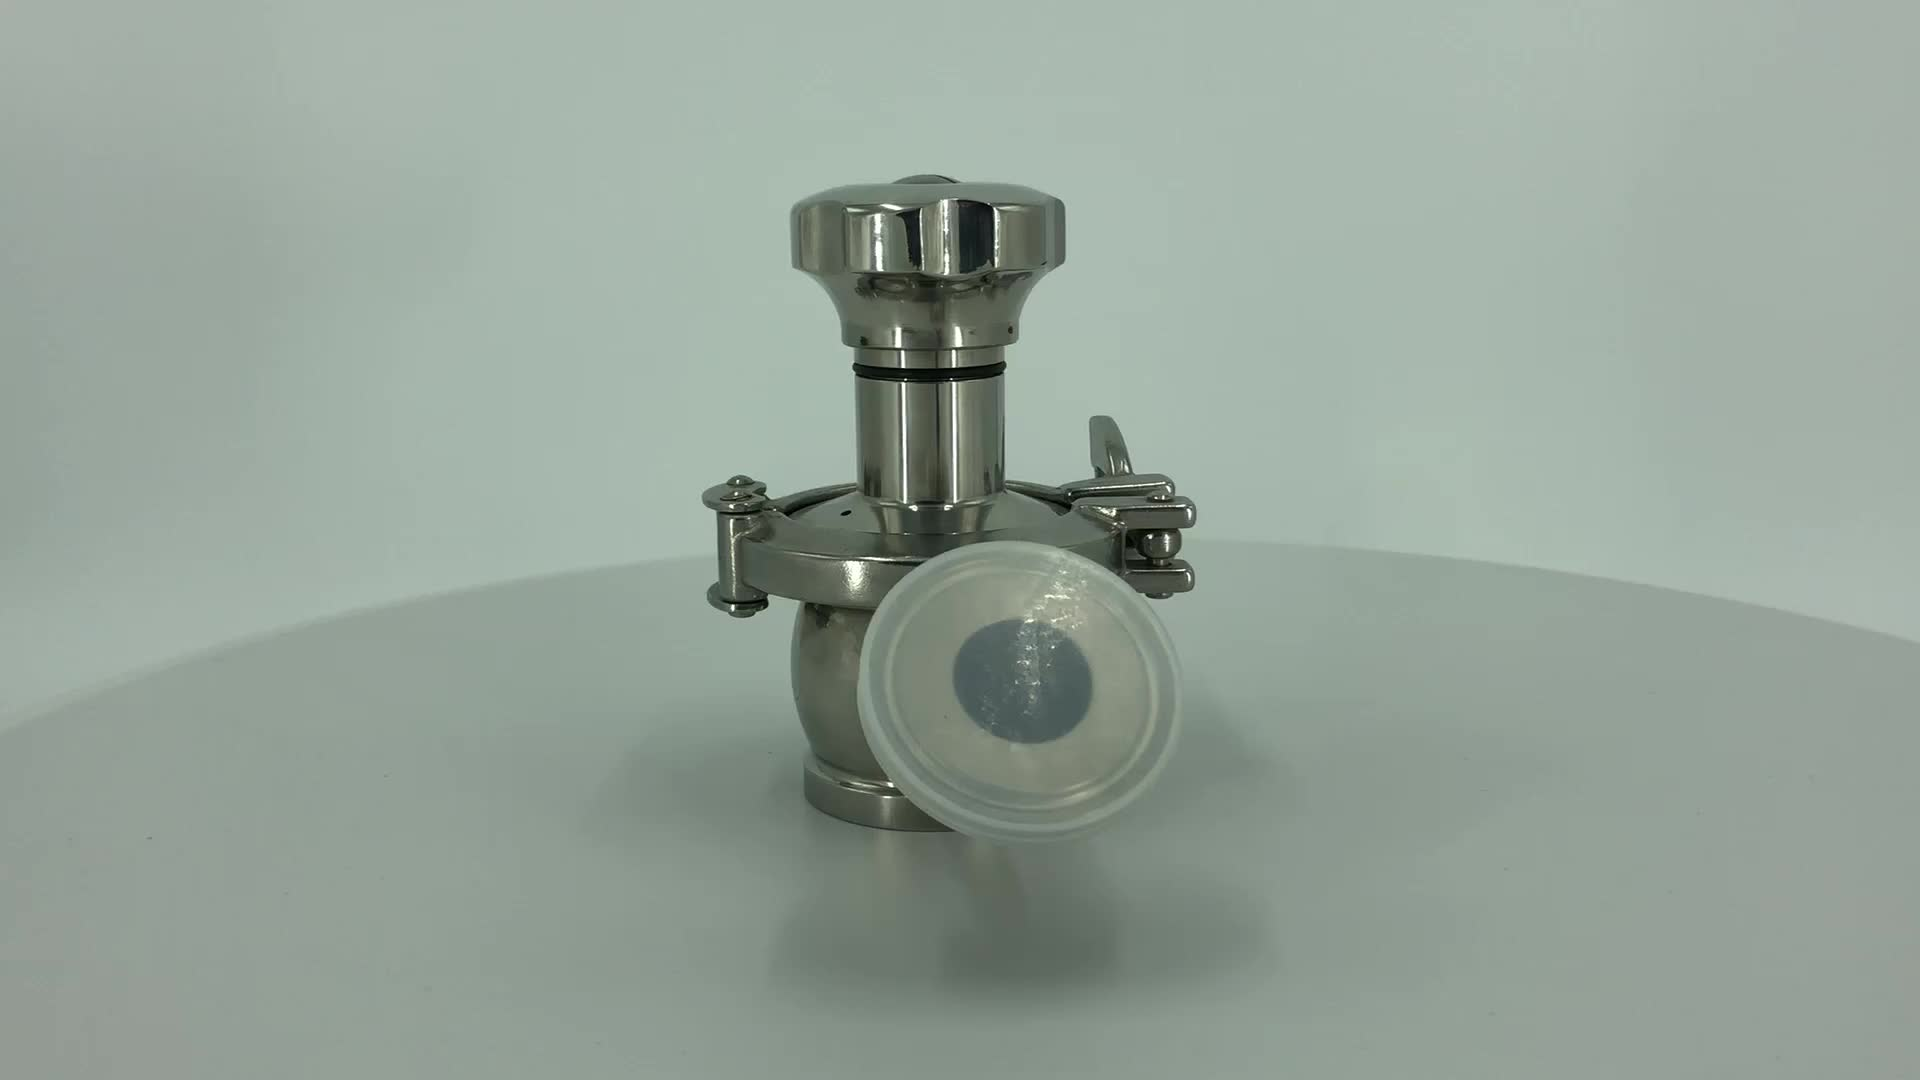 DONJOY Stainless Steel diaphragm control valve food grade diaphragm tank bottom valve